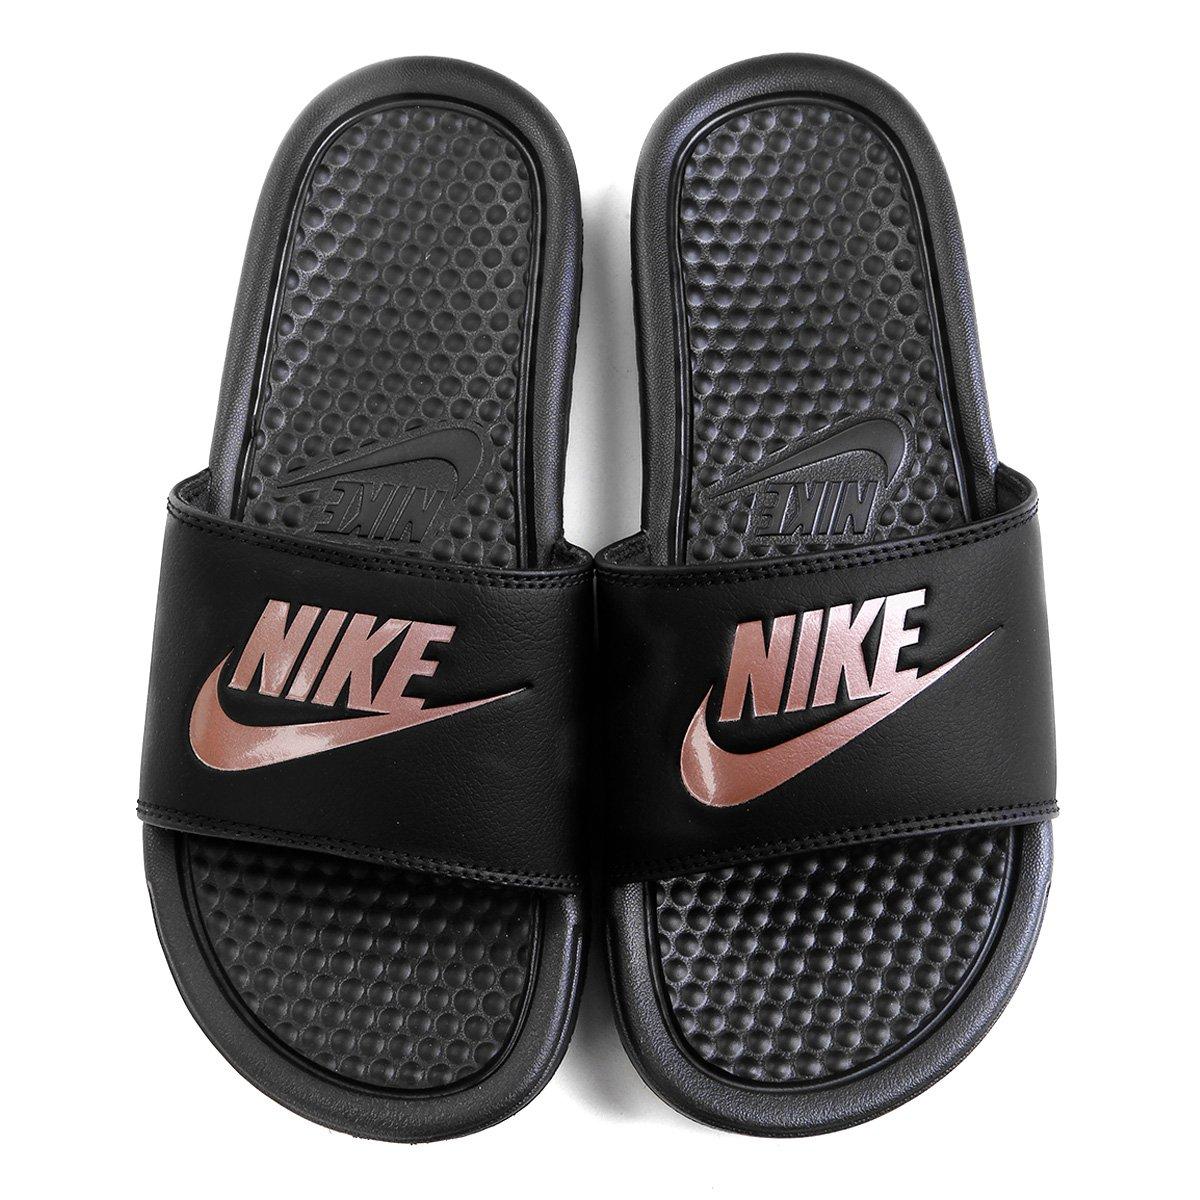 Chinelo Nike Benassi Jdi Slide Feminino Preto E Pink